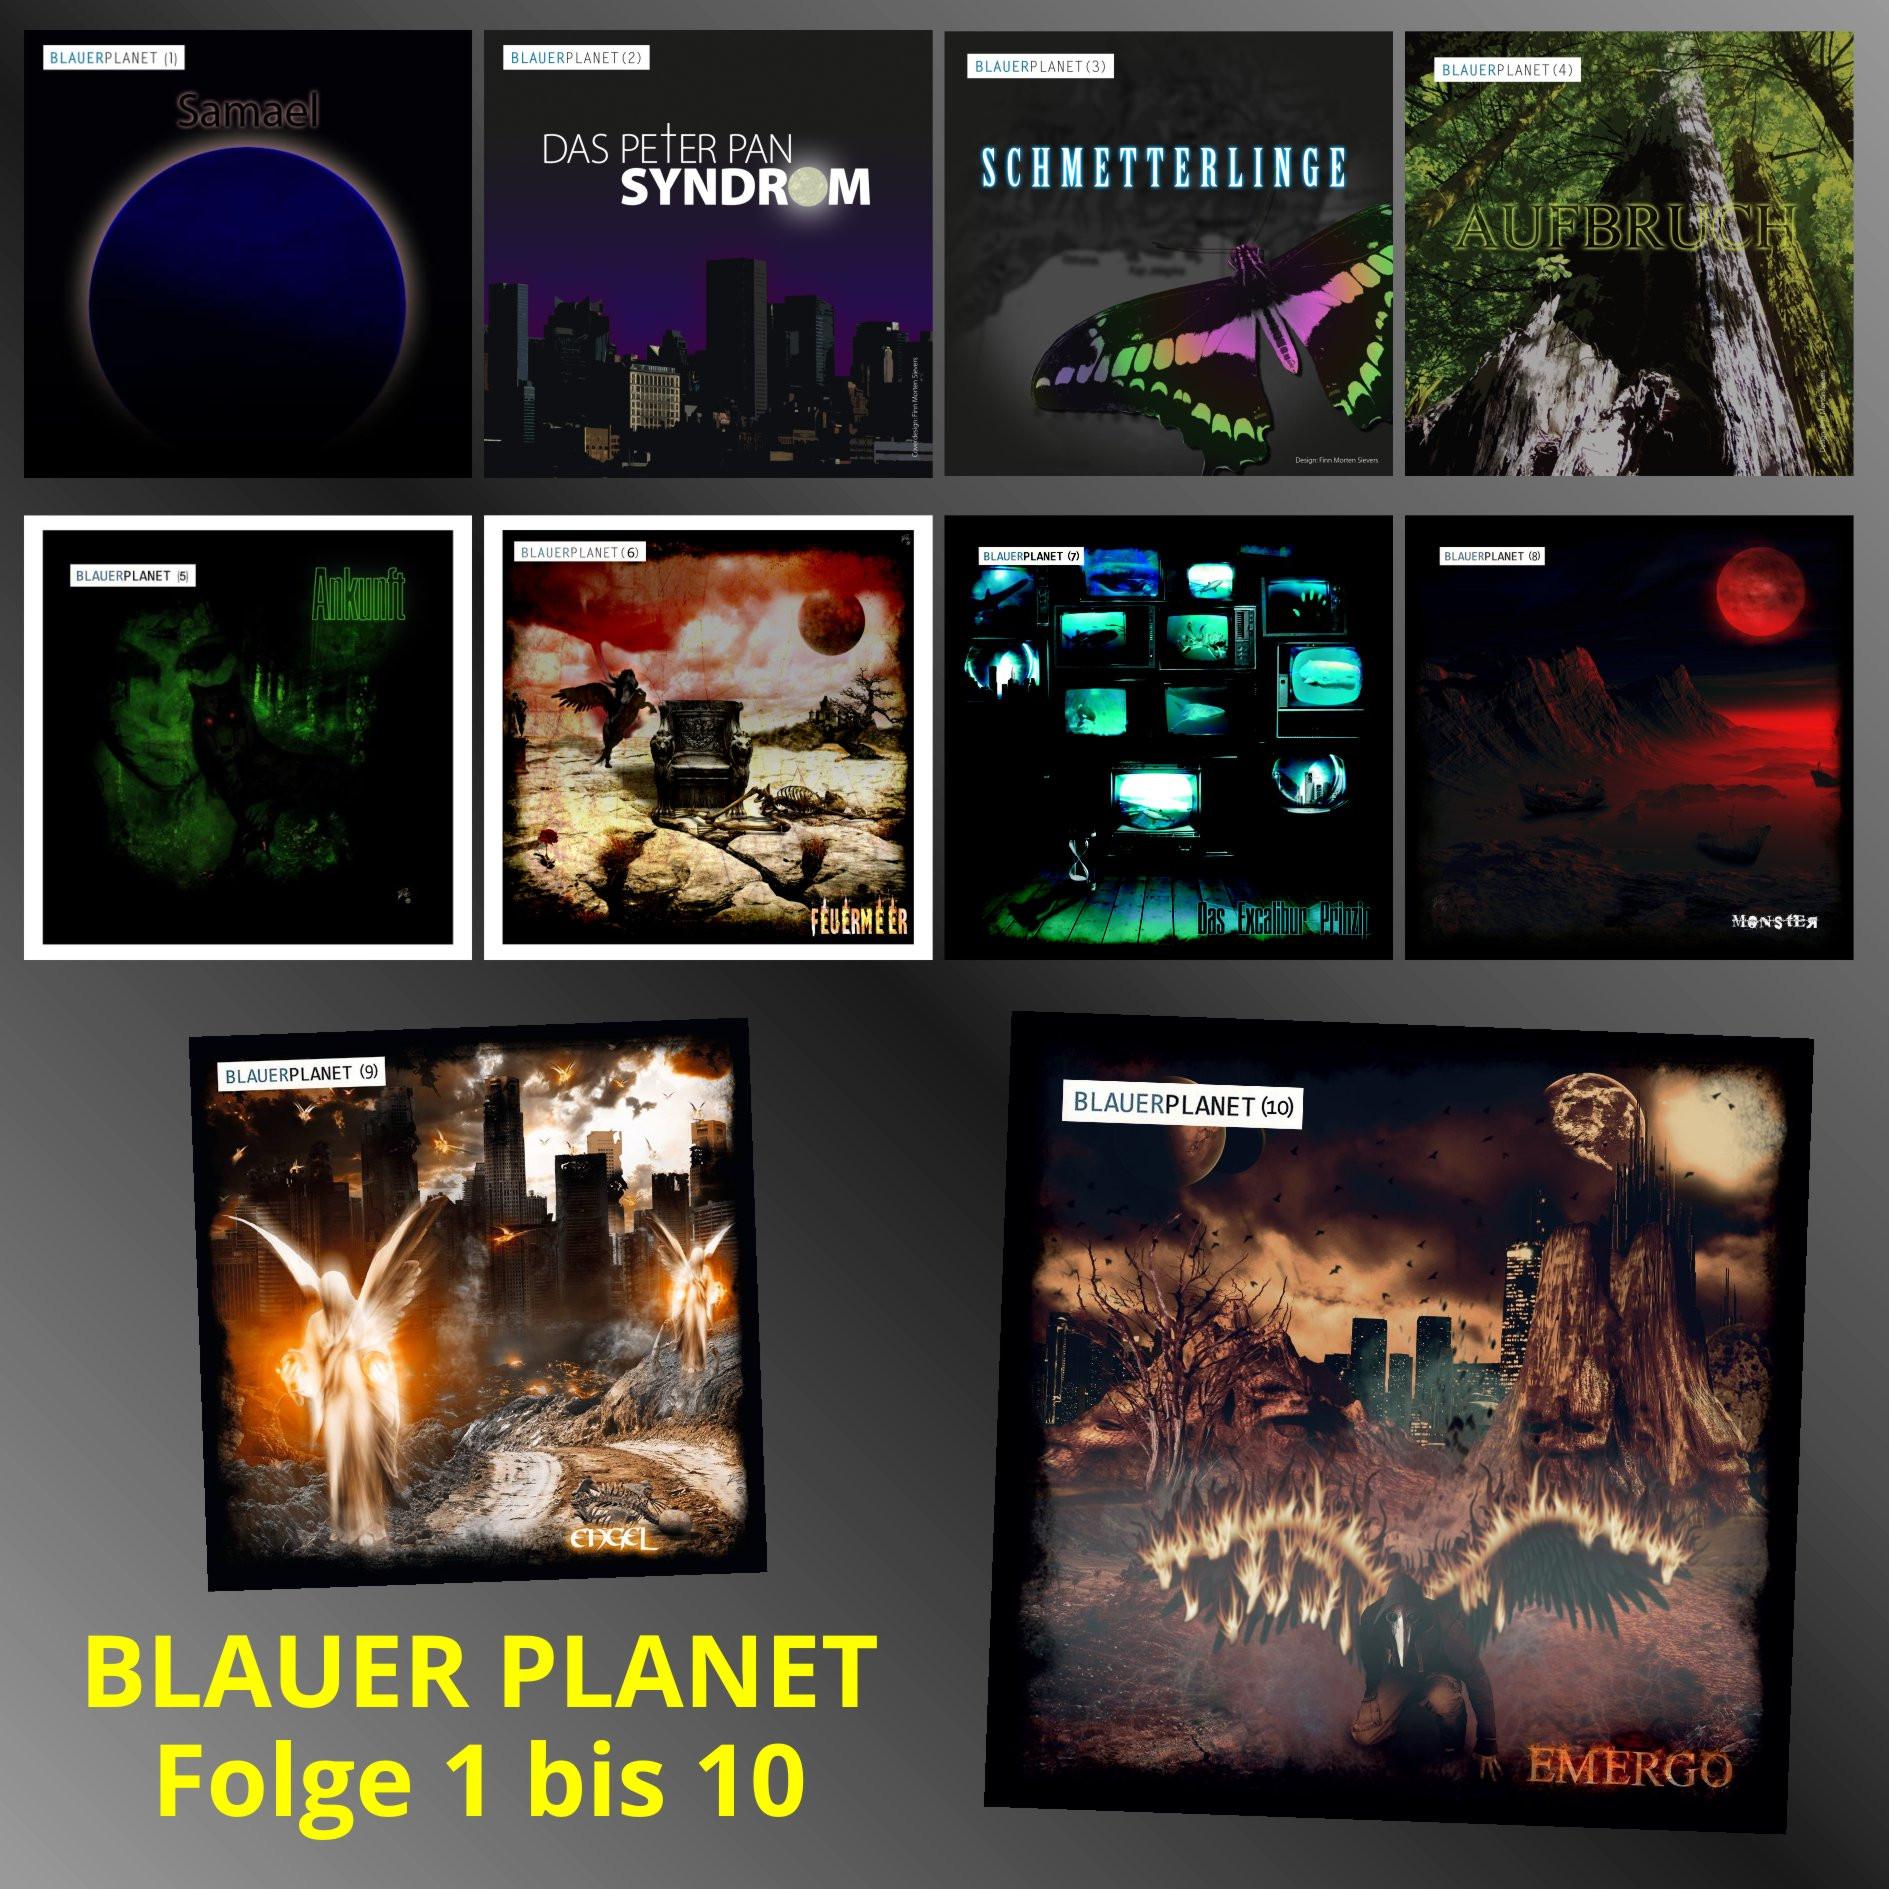 Blauer Planet - Komplettpaket - Folge 1 bis 10 (inkl. Samael Redux)